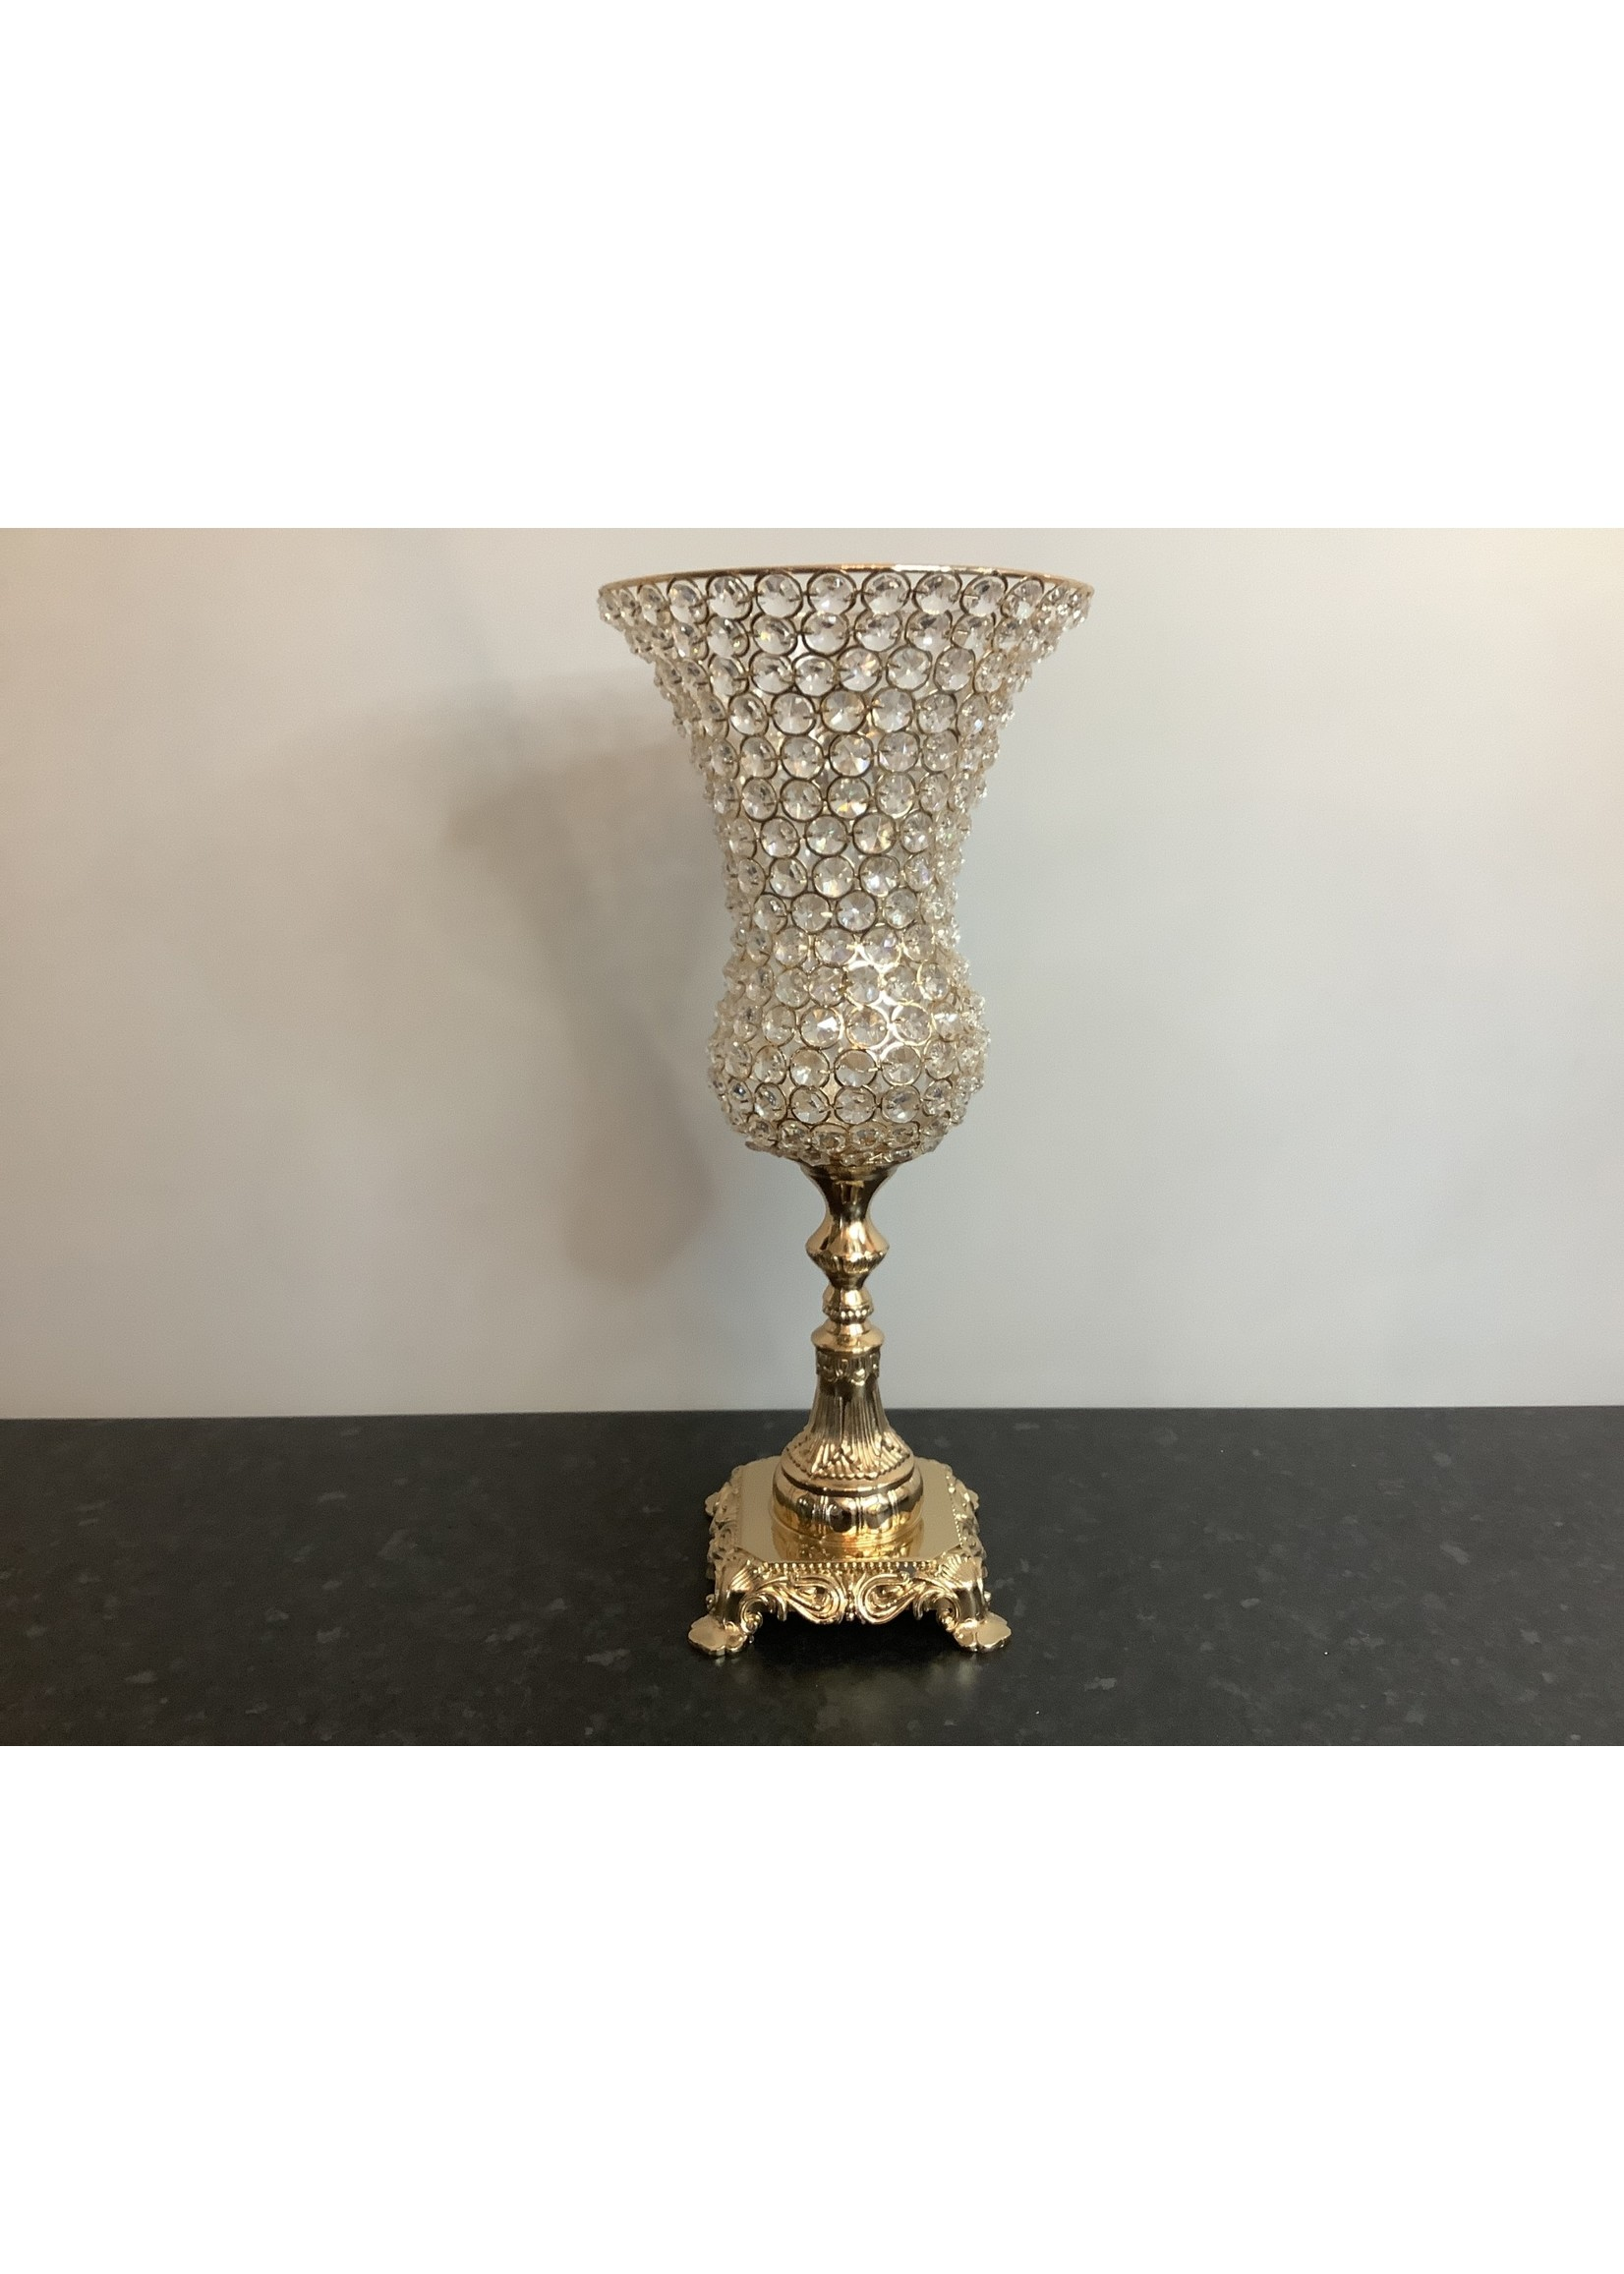 Golden crystal vase 47cm tall